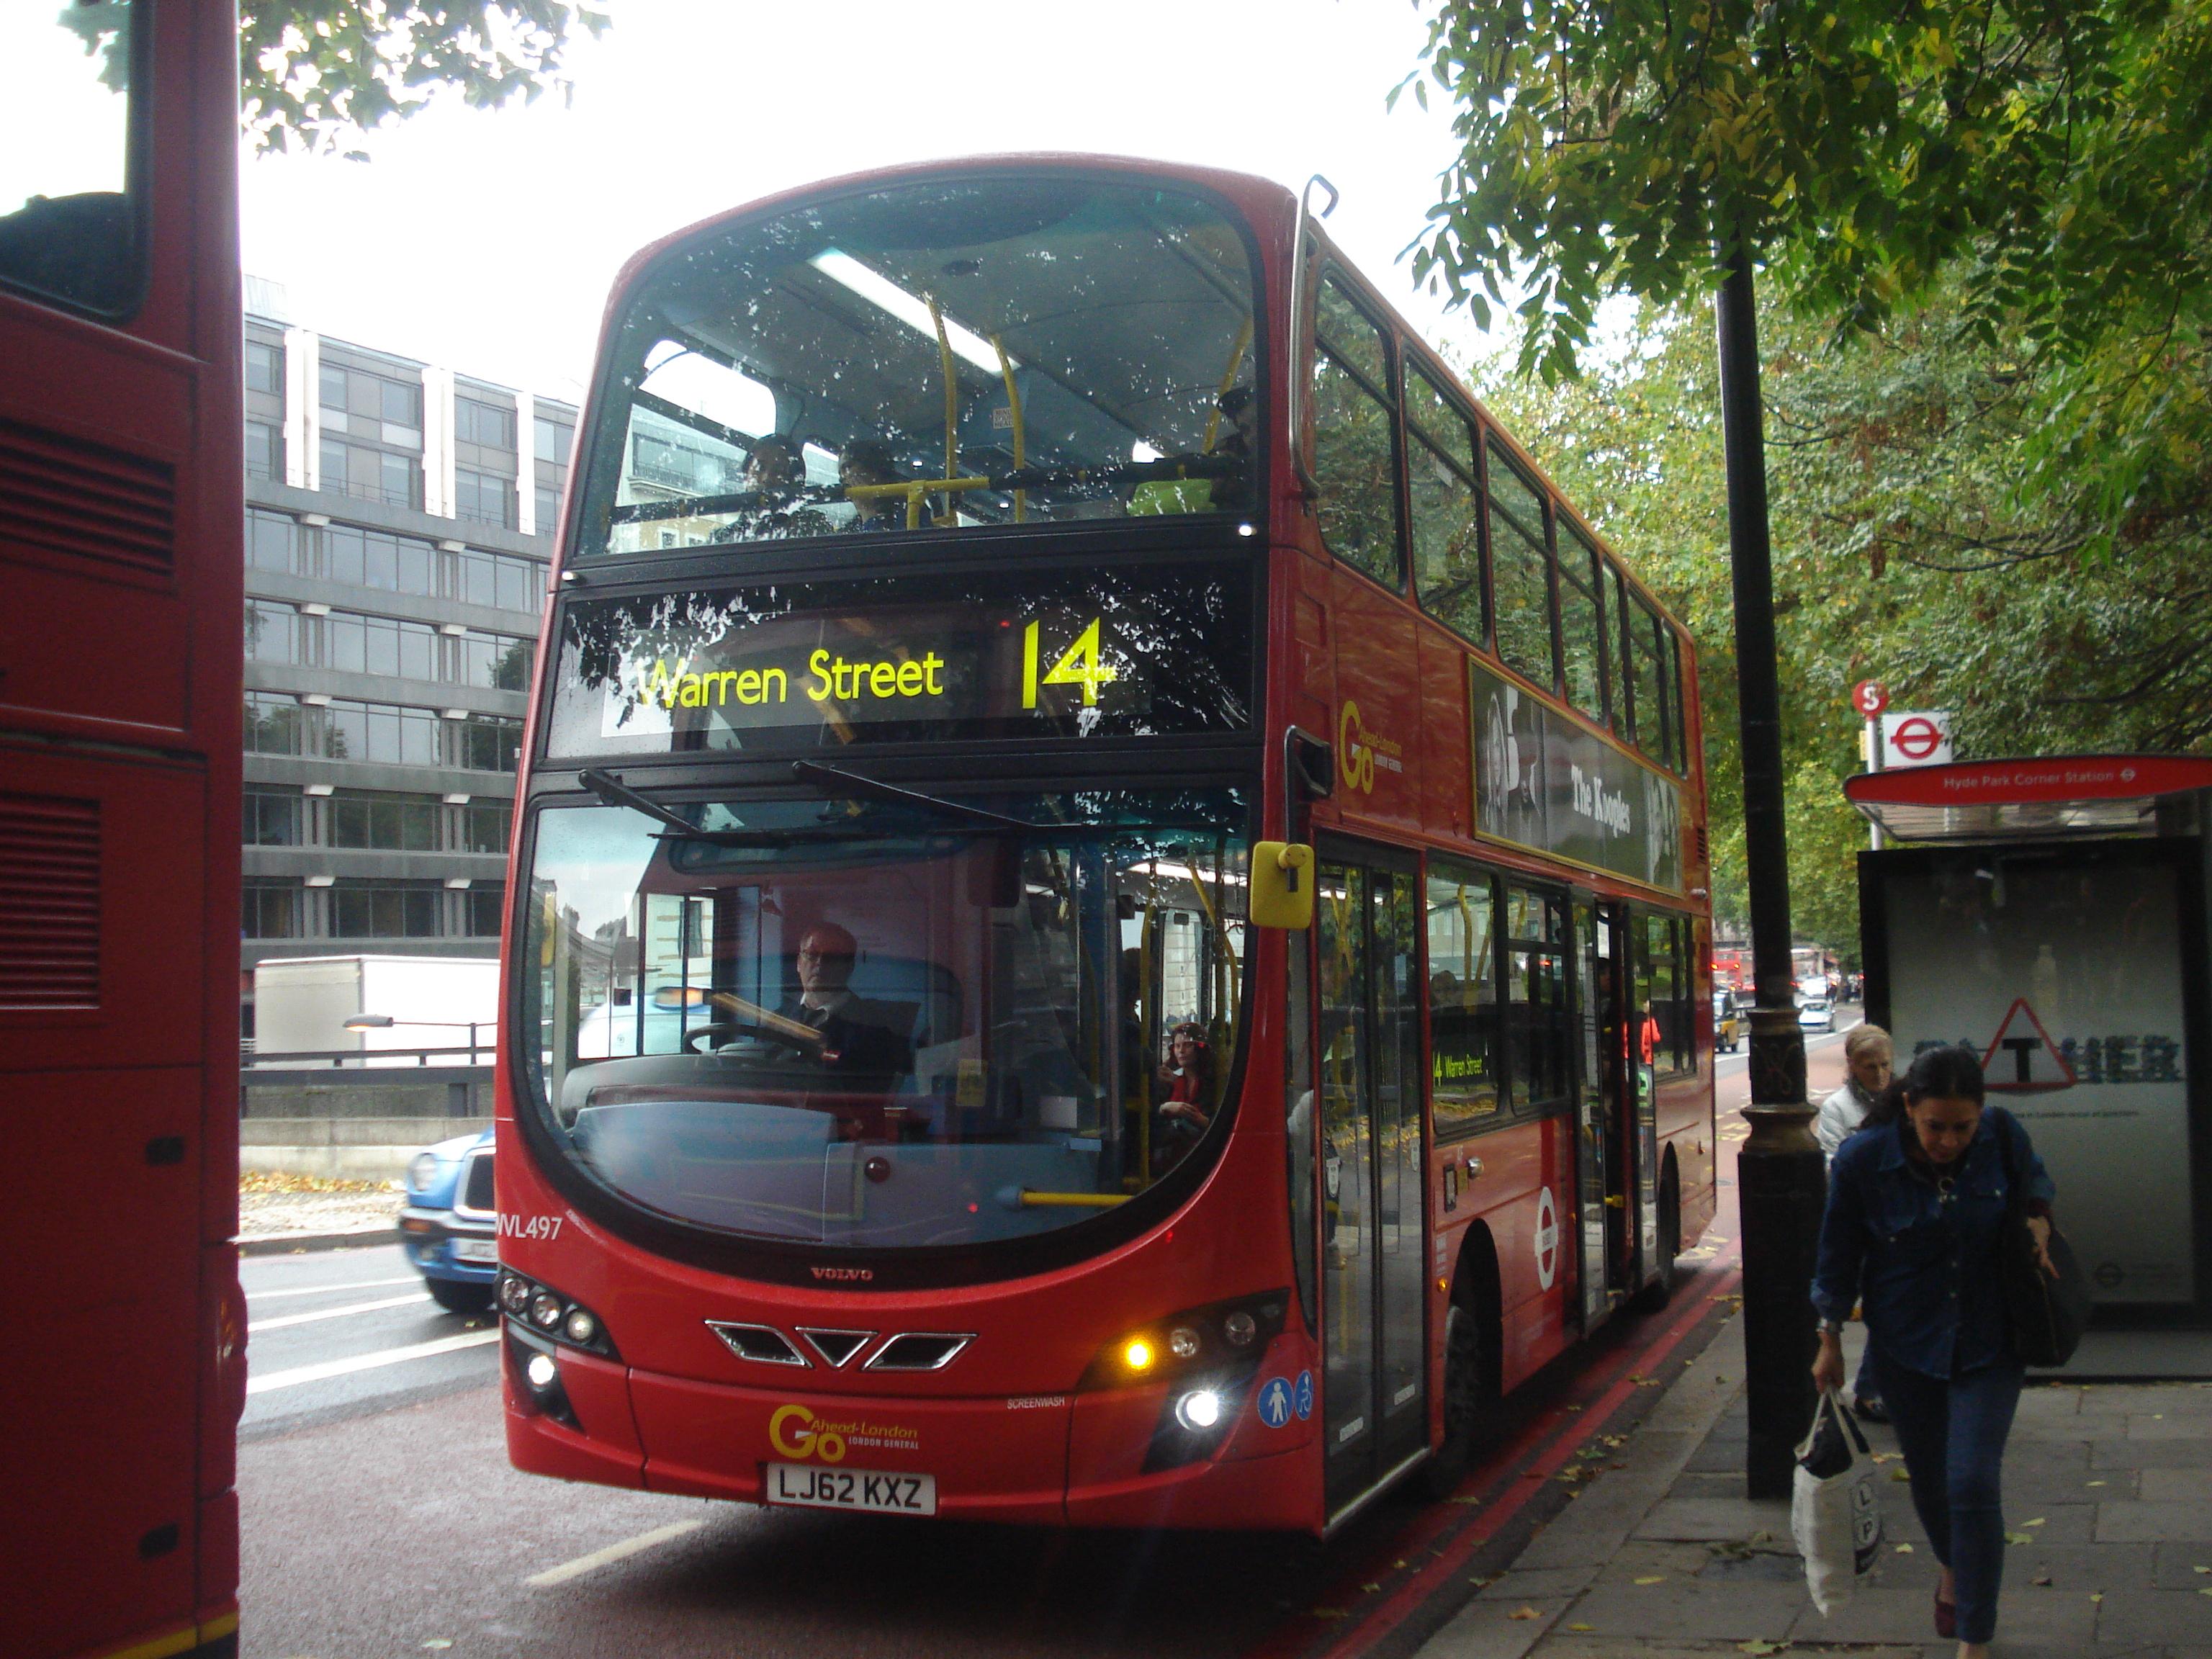 file:london general wvl497 on route 14, hyde park corner